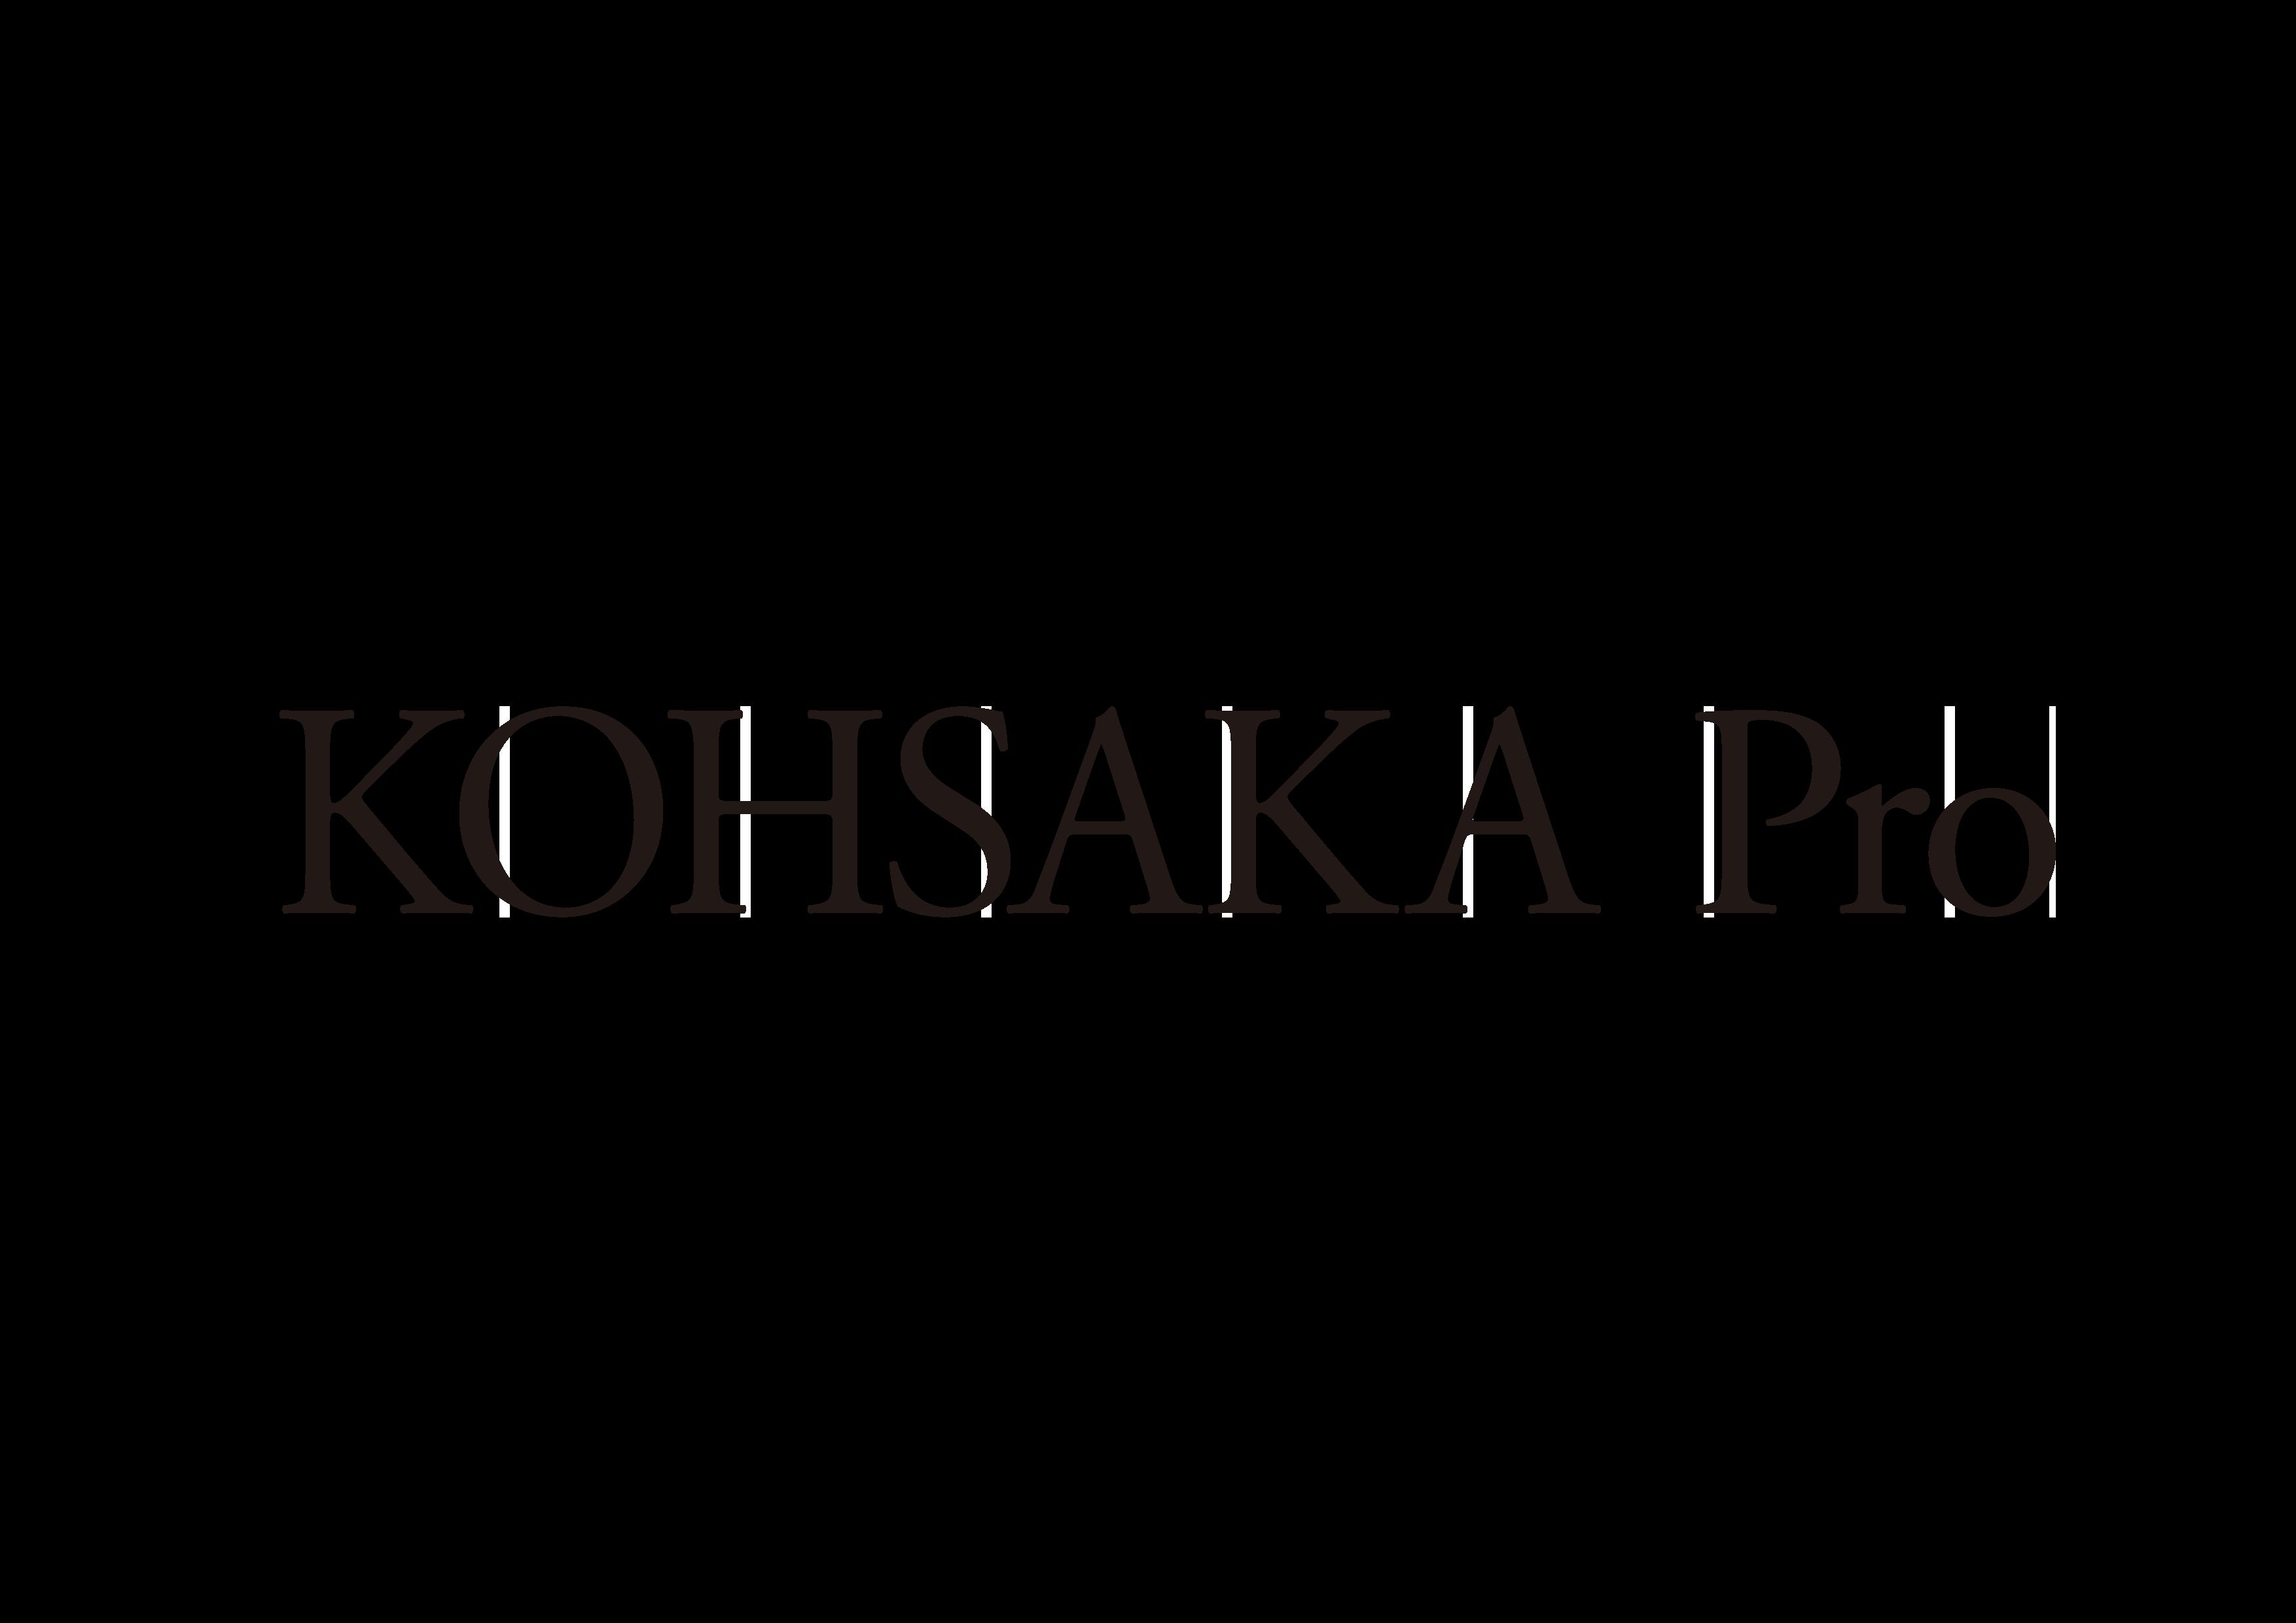 KOHSAKA Pro